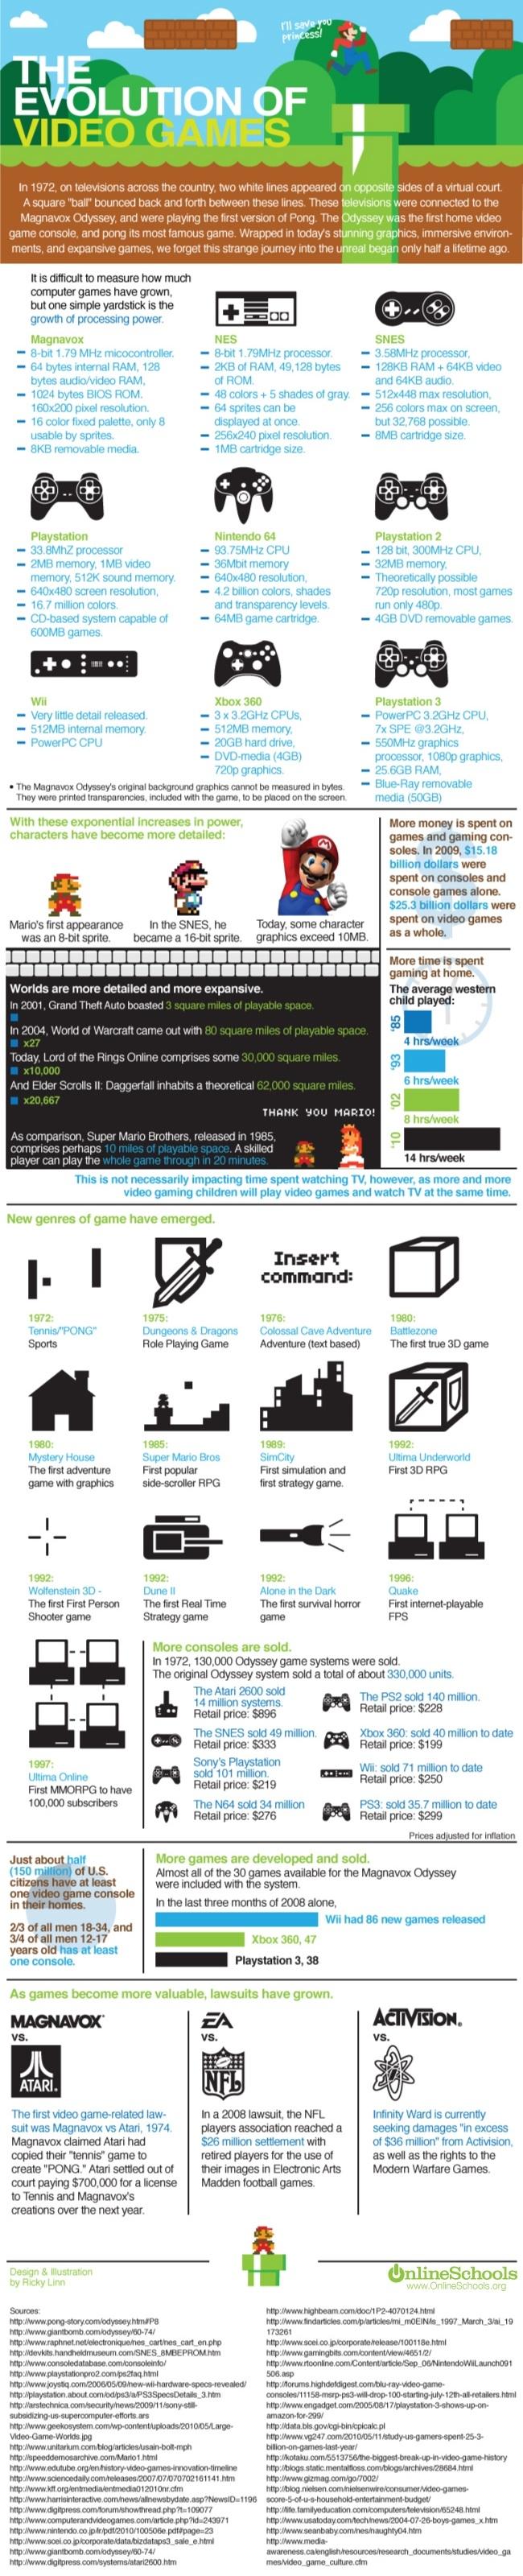 Video Game Evolution Evolution of video games